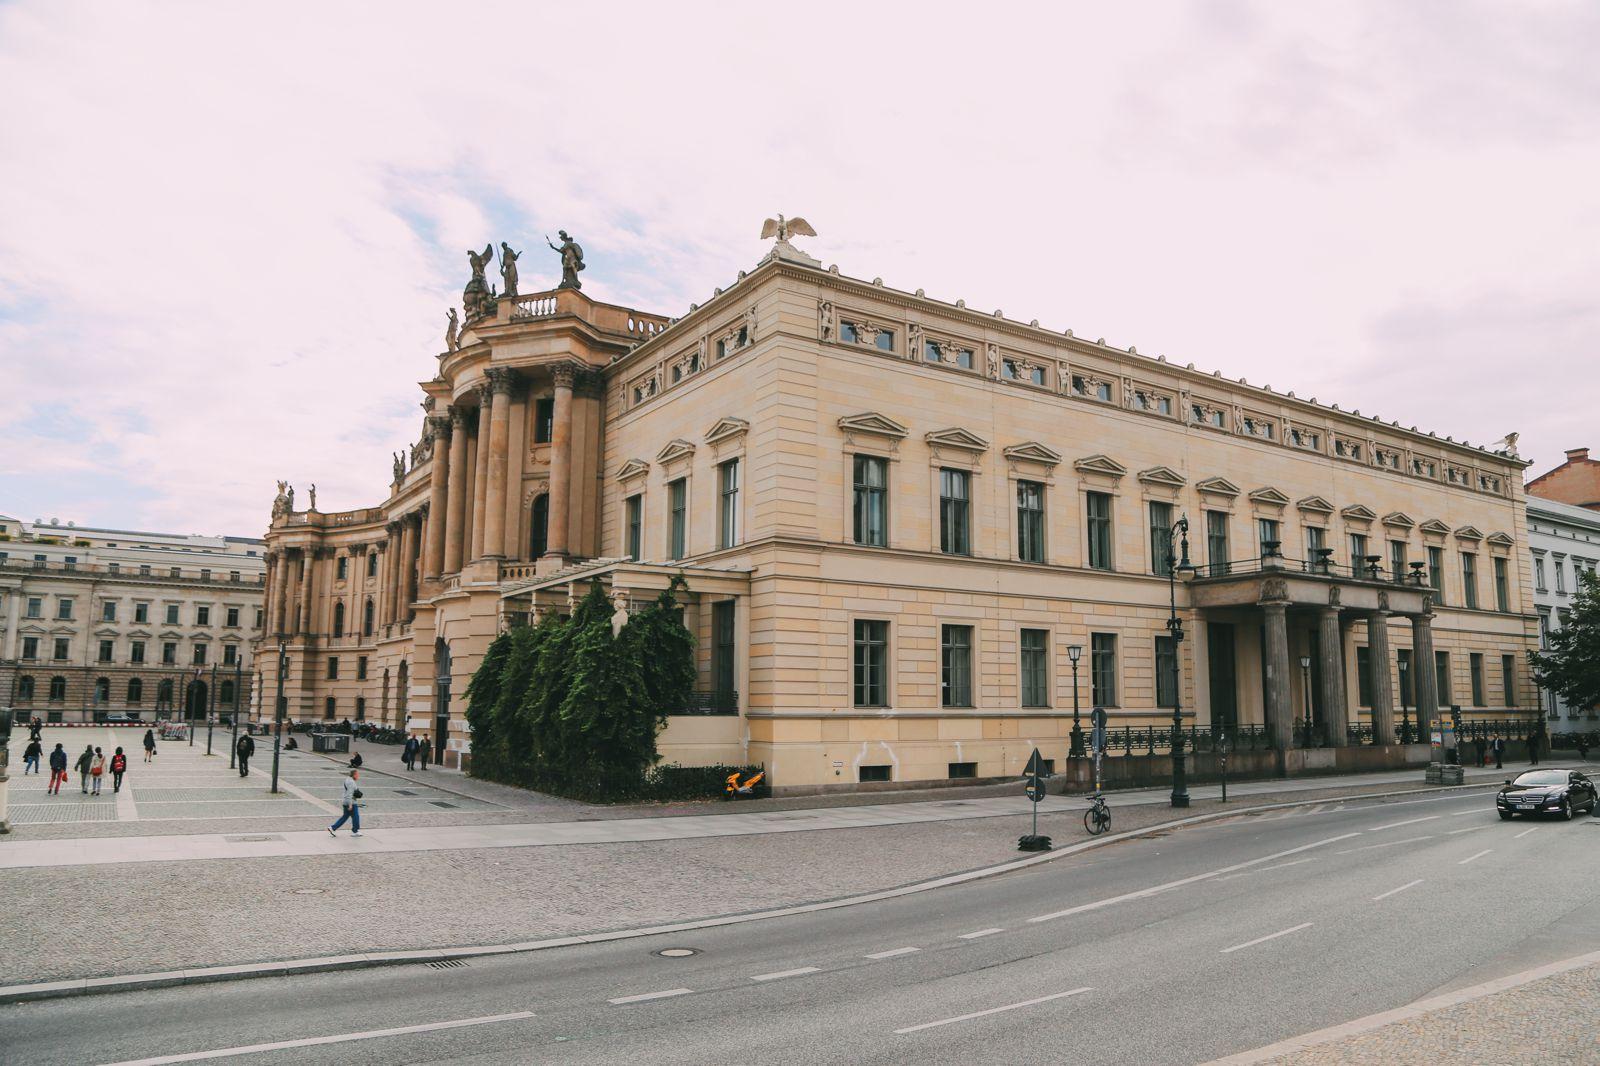 Sightseeing In Berlin, Germany - Part 2 (15)